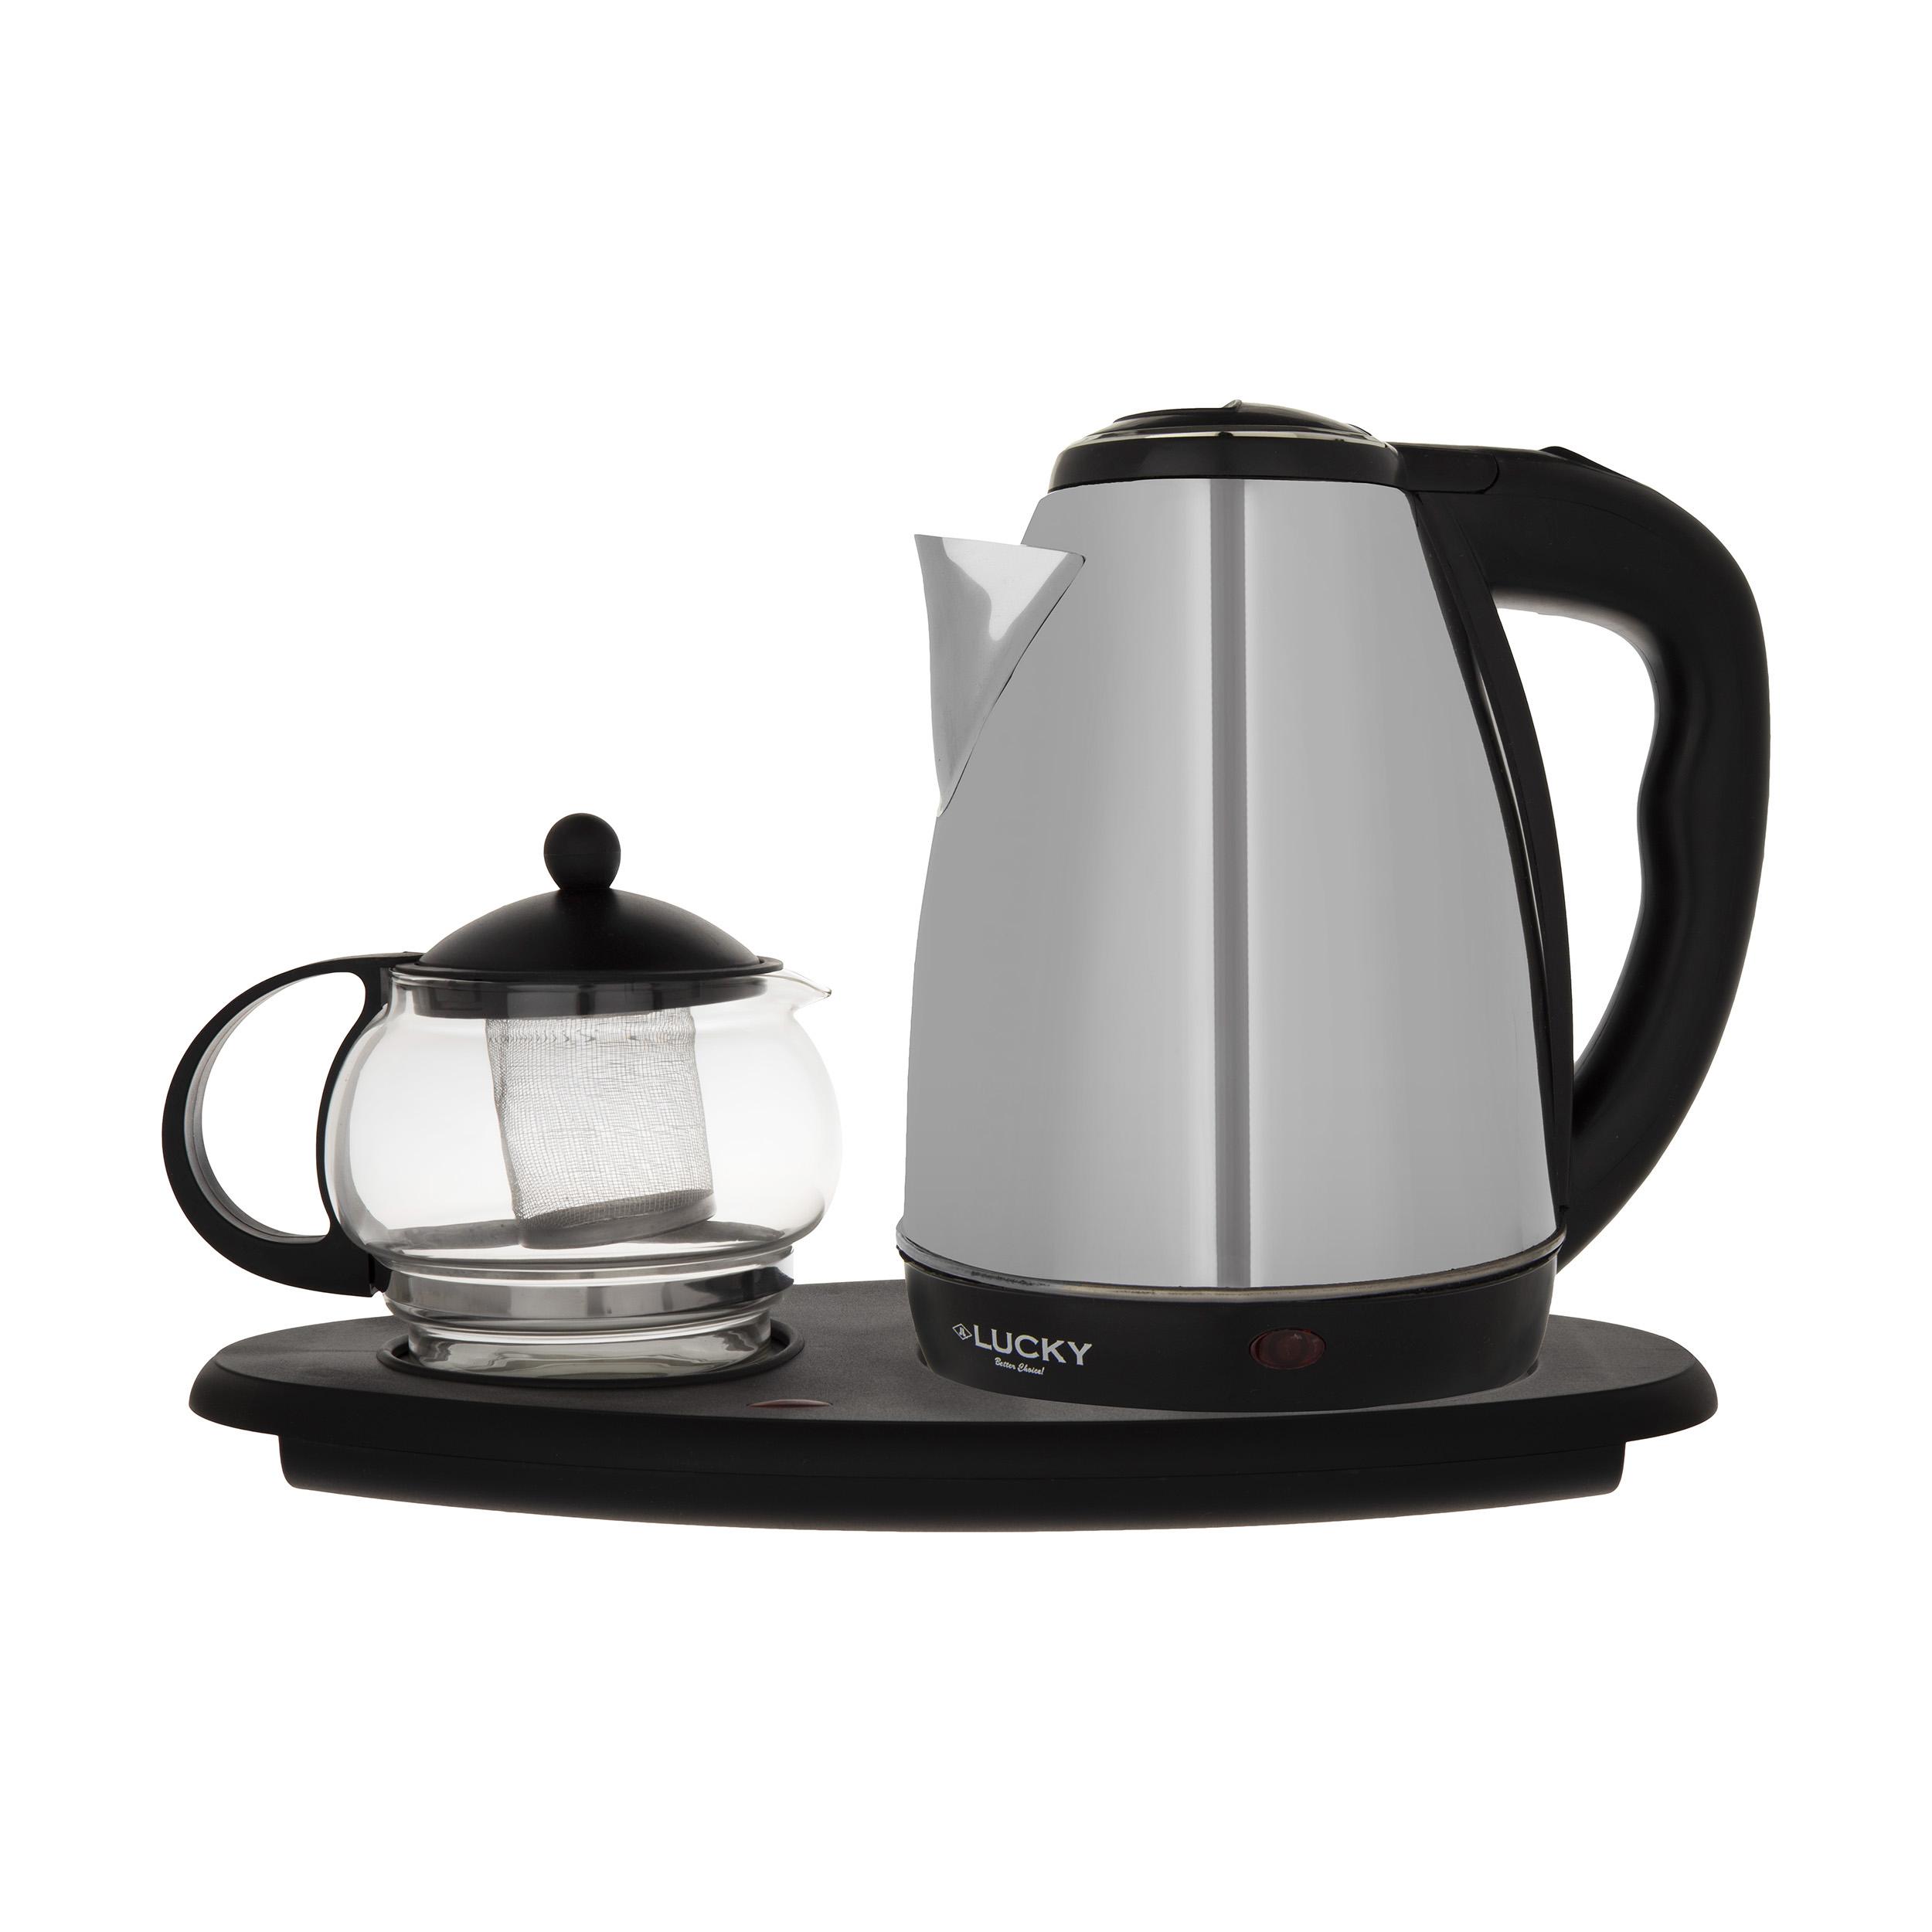 چای ساز لوکی مدل JL-2000